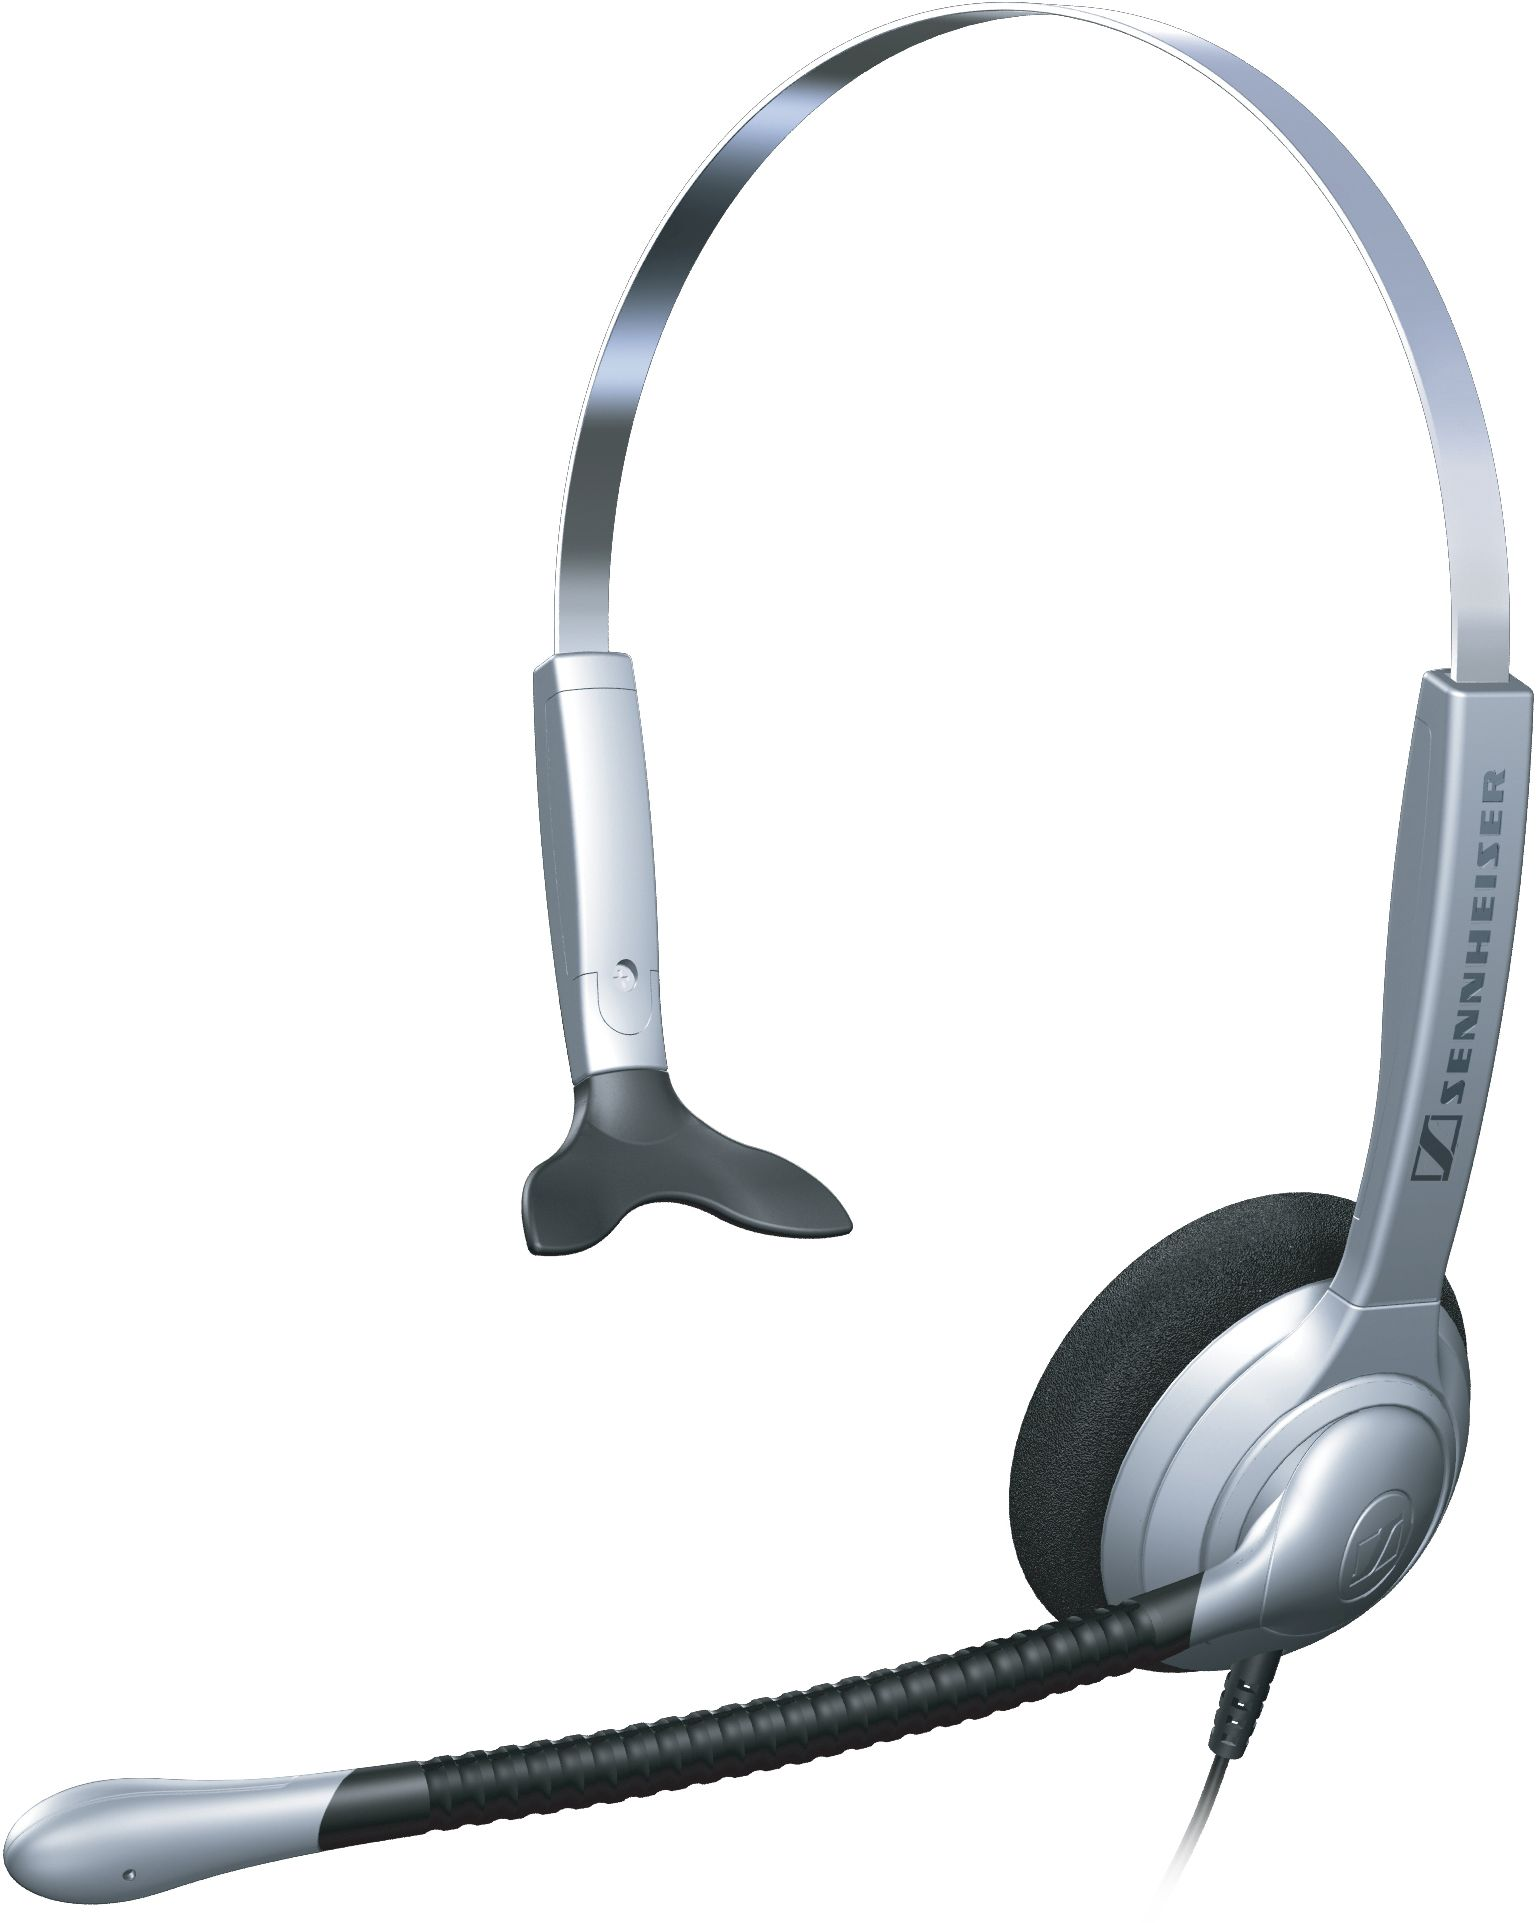 Image of Sennheiser SH 330 IP Mono Corded Headset for PC